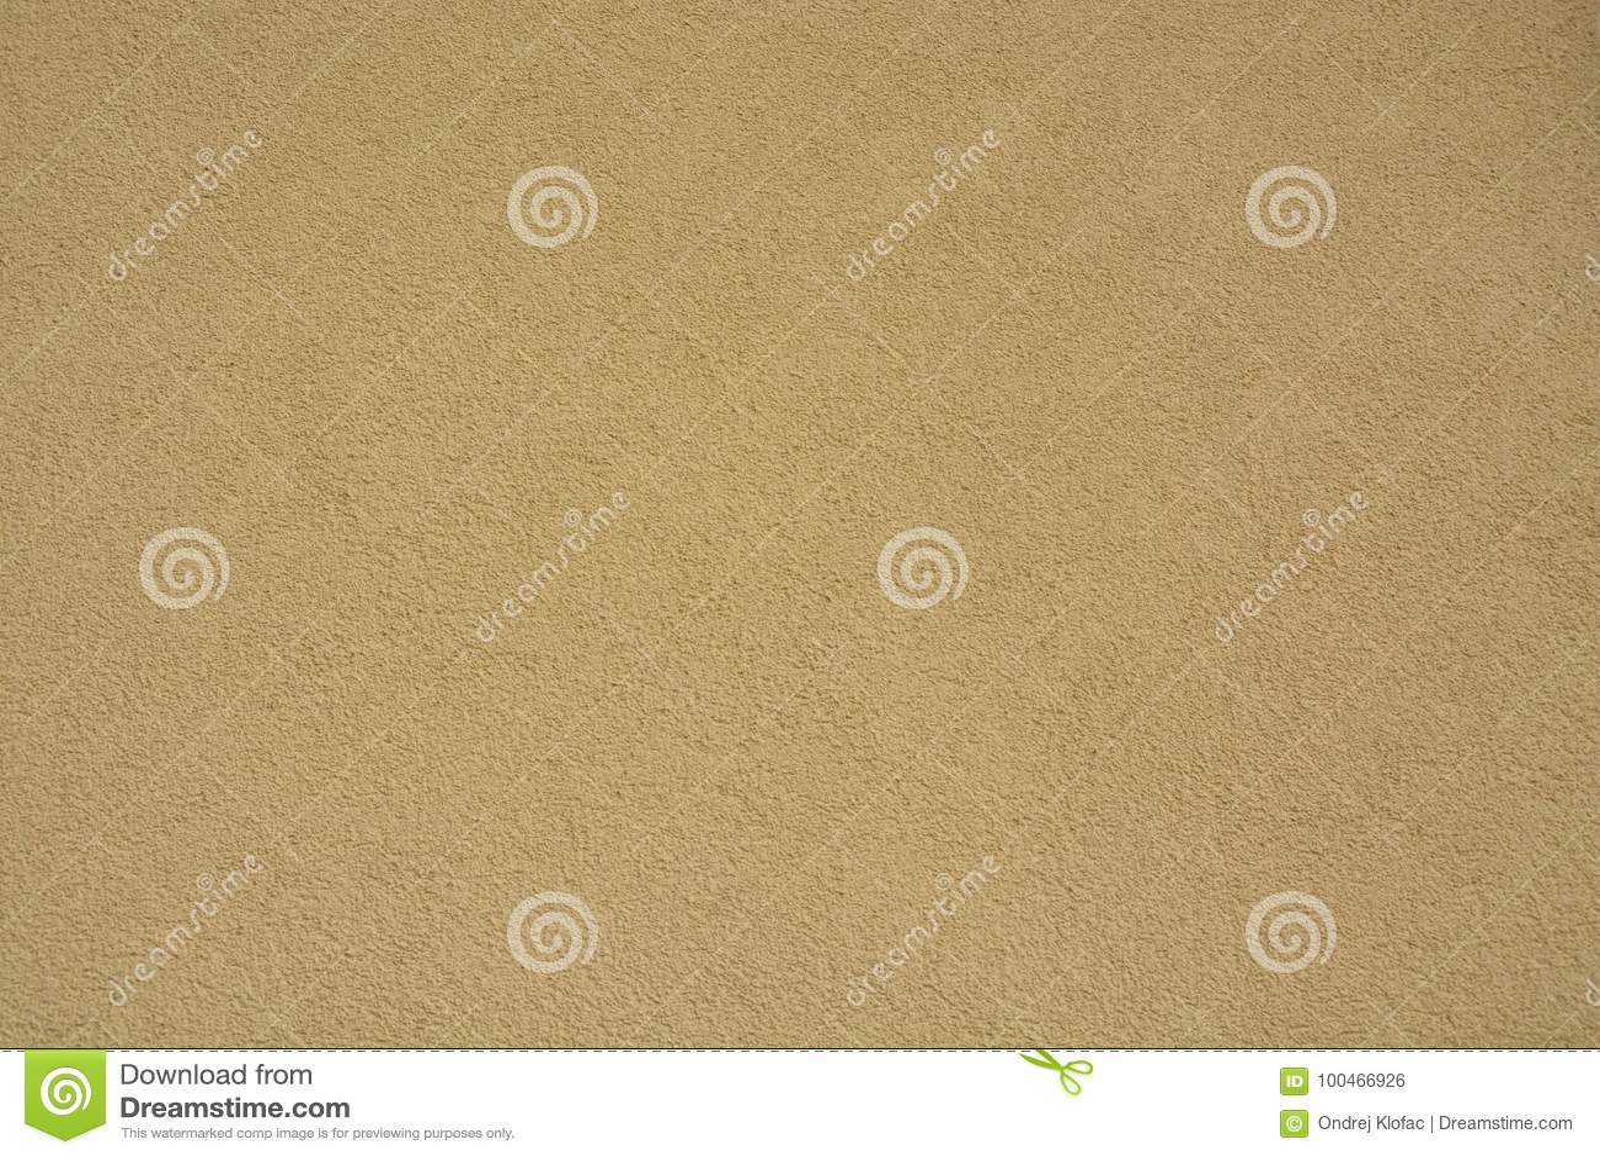 Plaster Brown Ocher Beige Nice Wall Decorative Seamless Texture ...